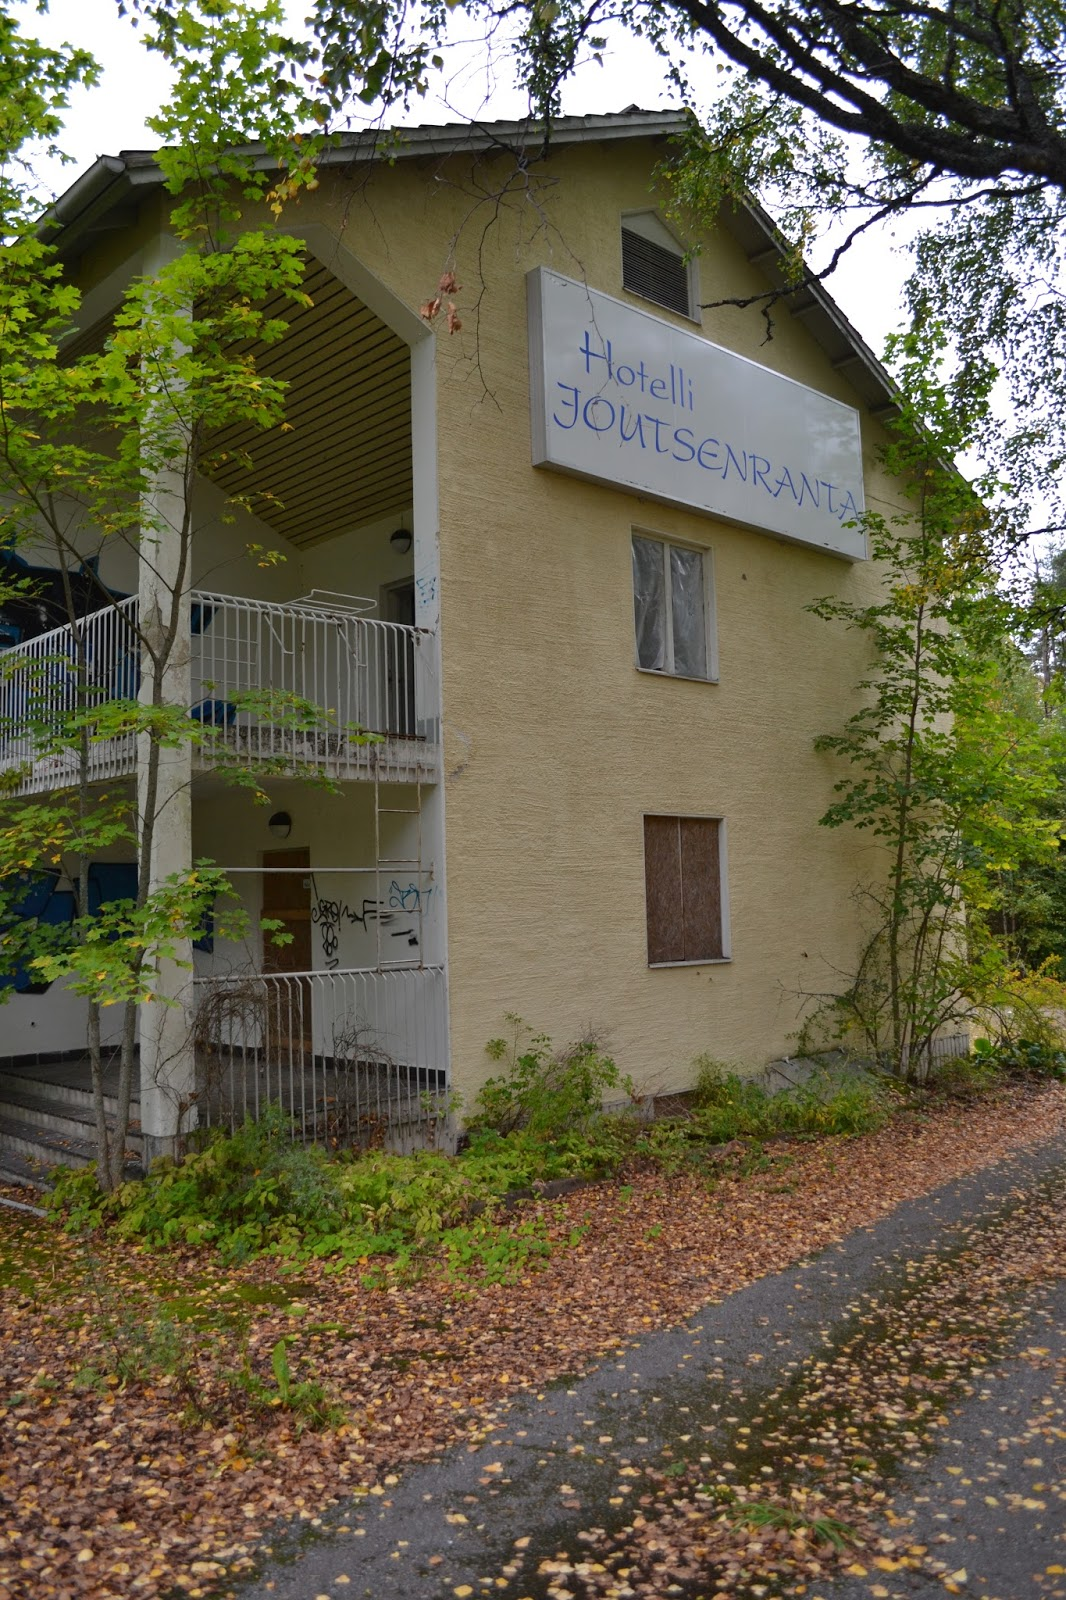 Hotelli Joutsenranta